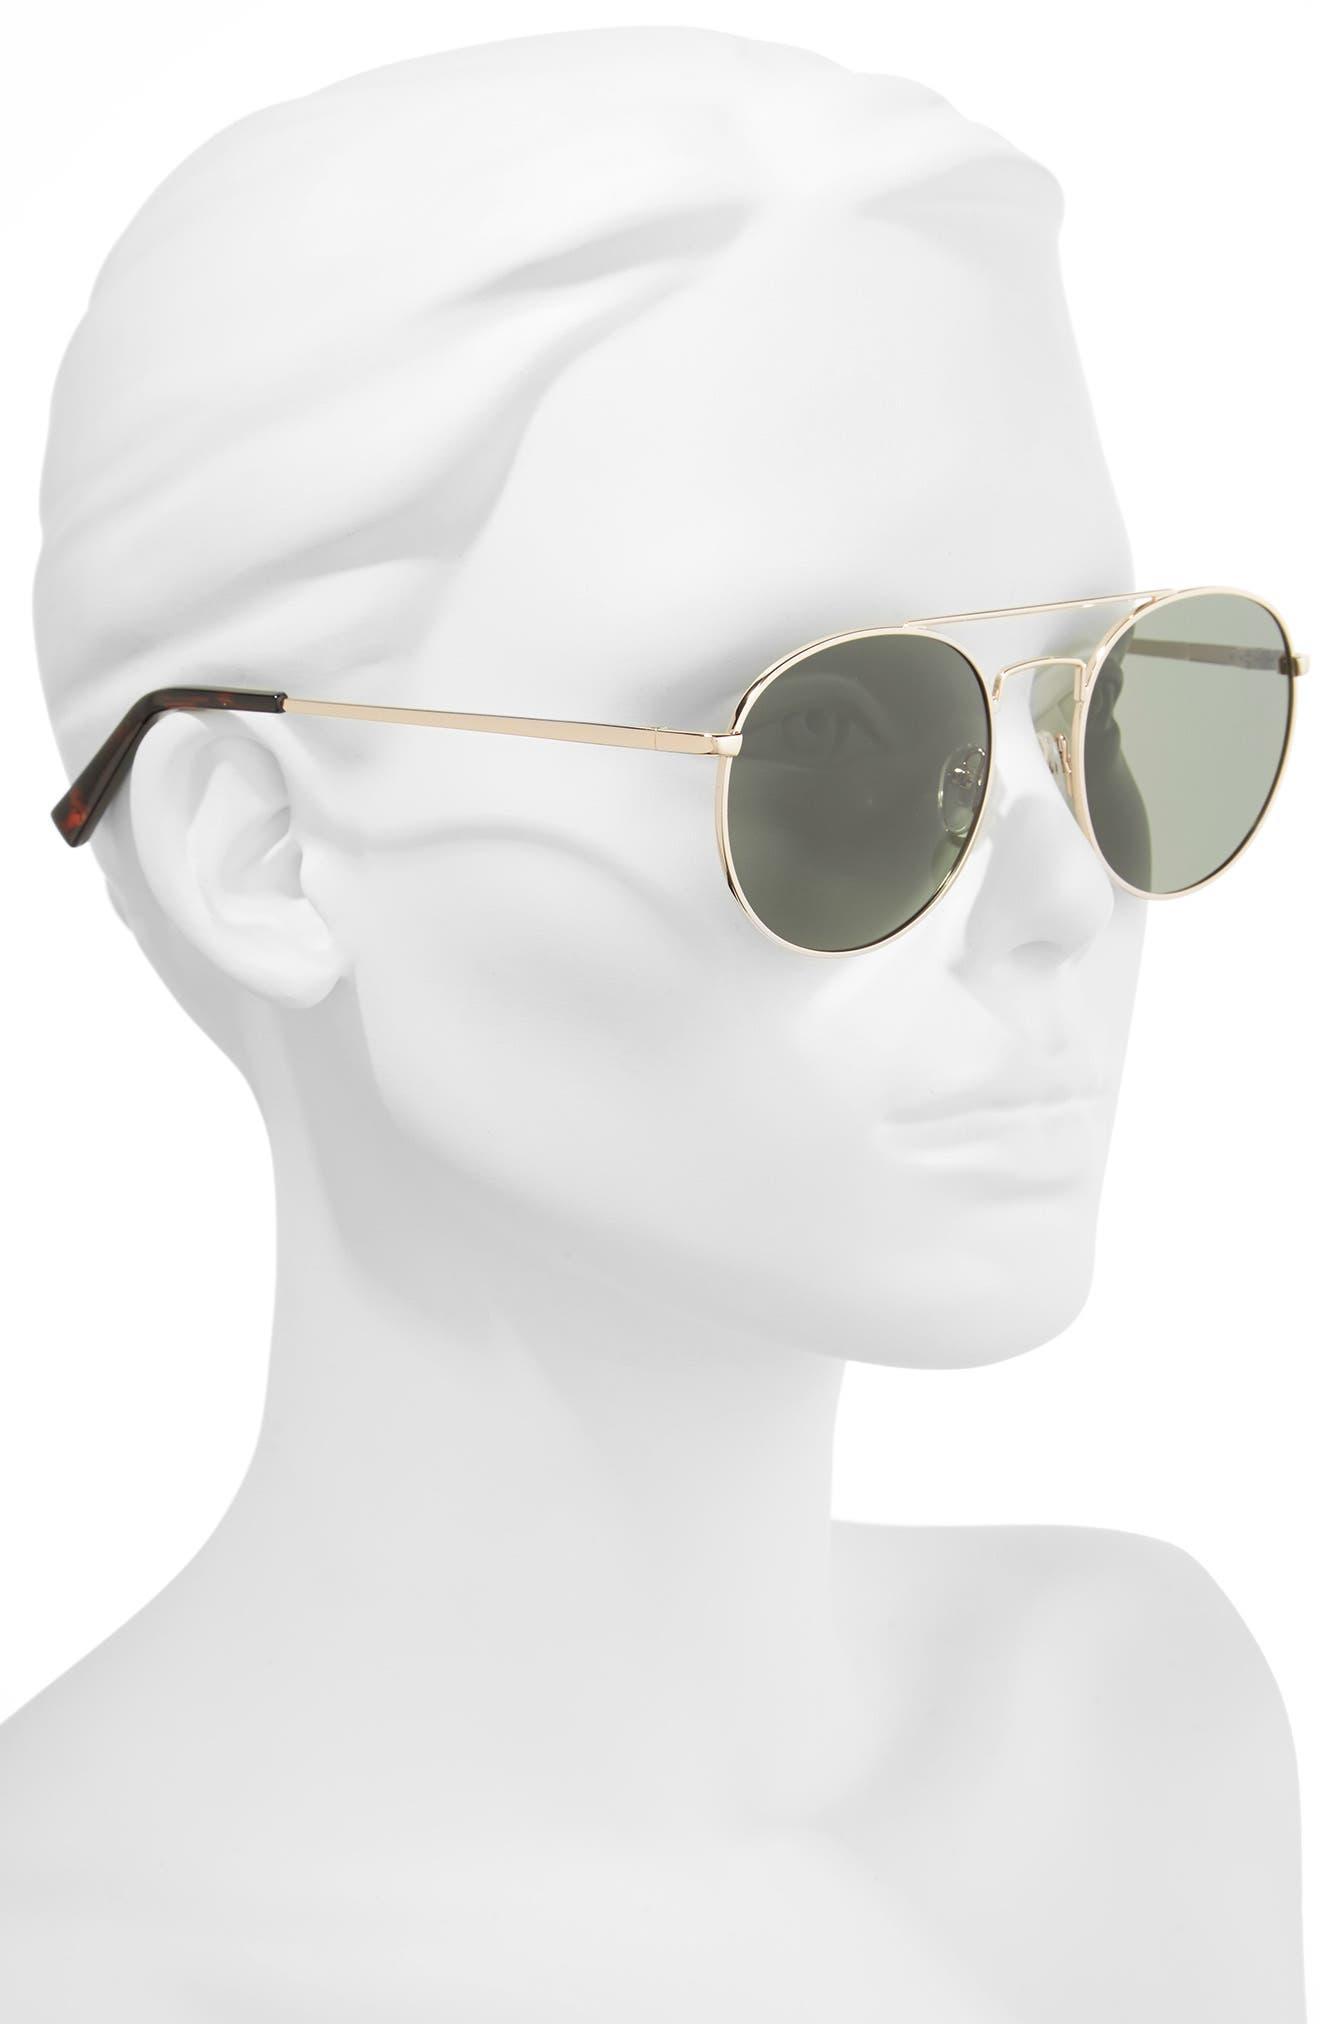 Revolution 53mm Aviator Sunglasses,                             Alternate thumbnail 2, color,                             GOLD